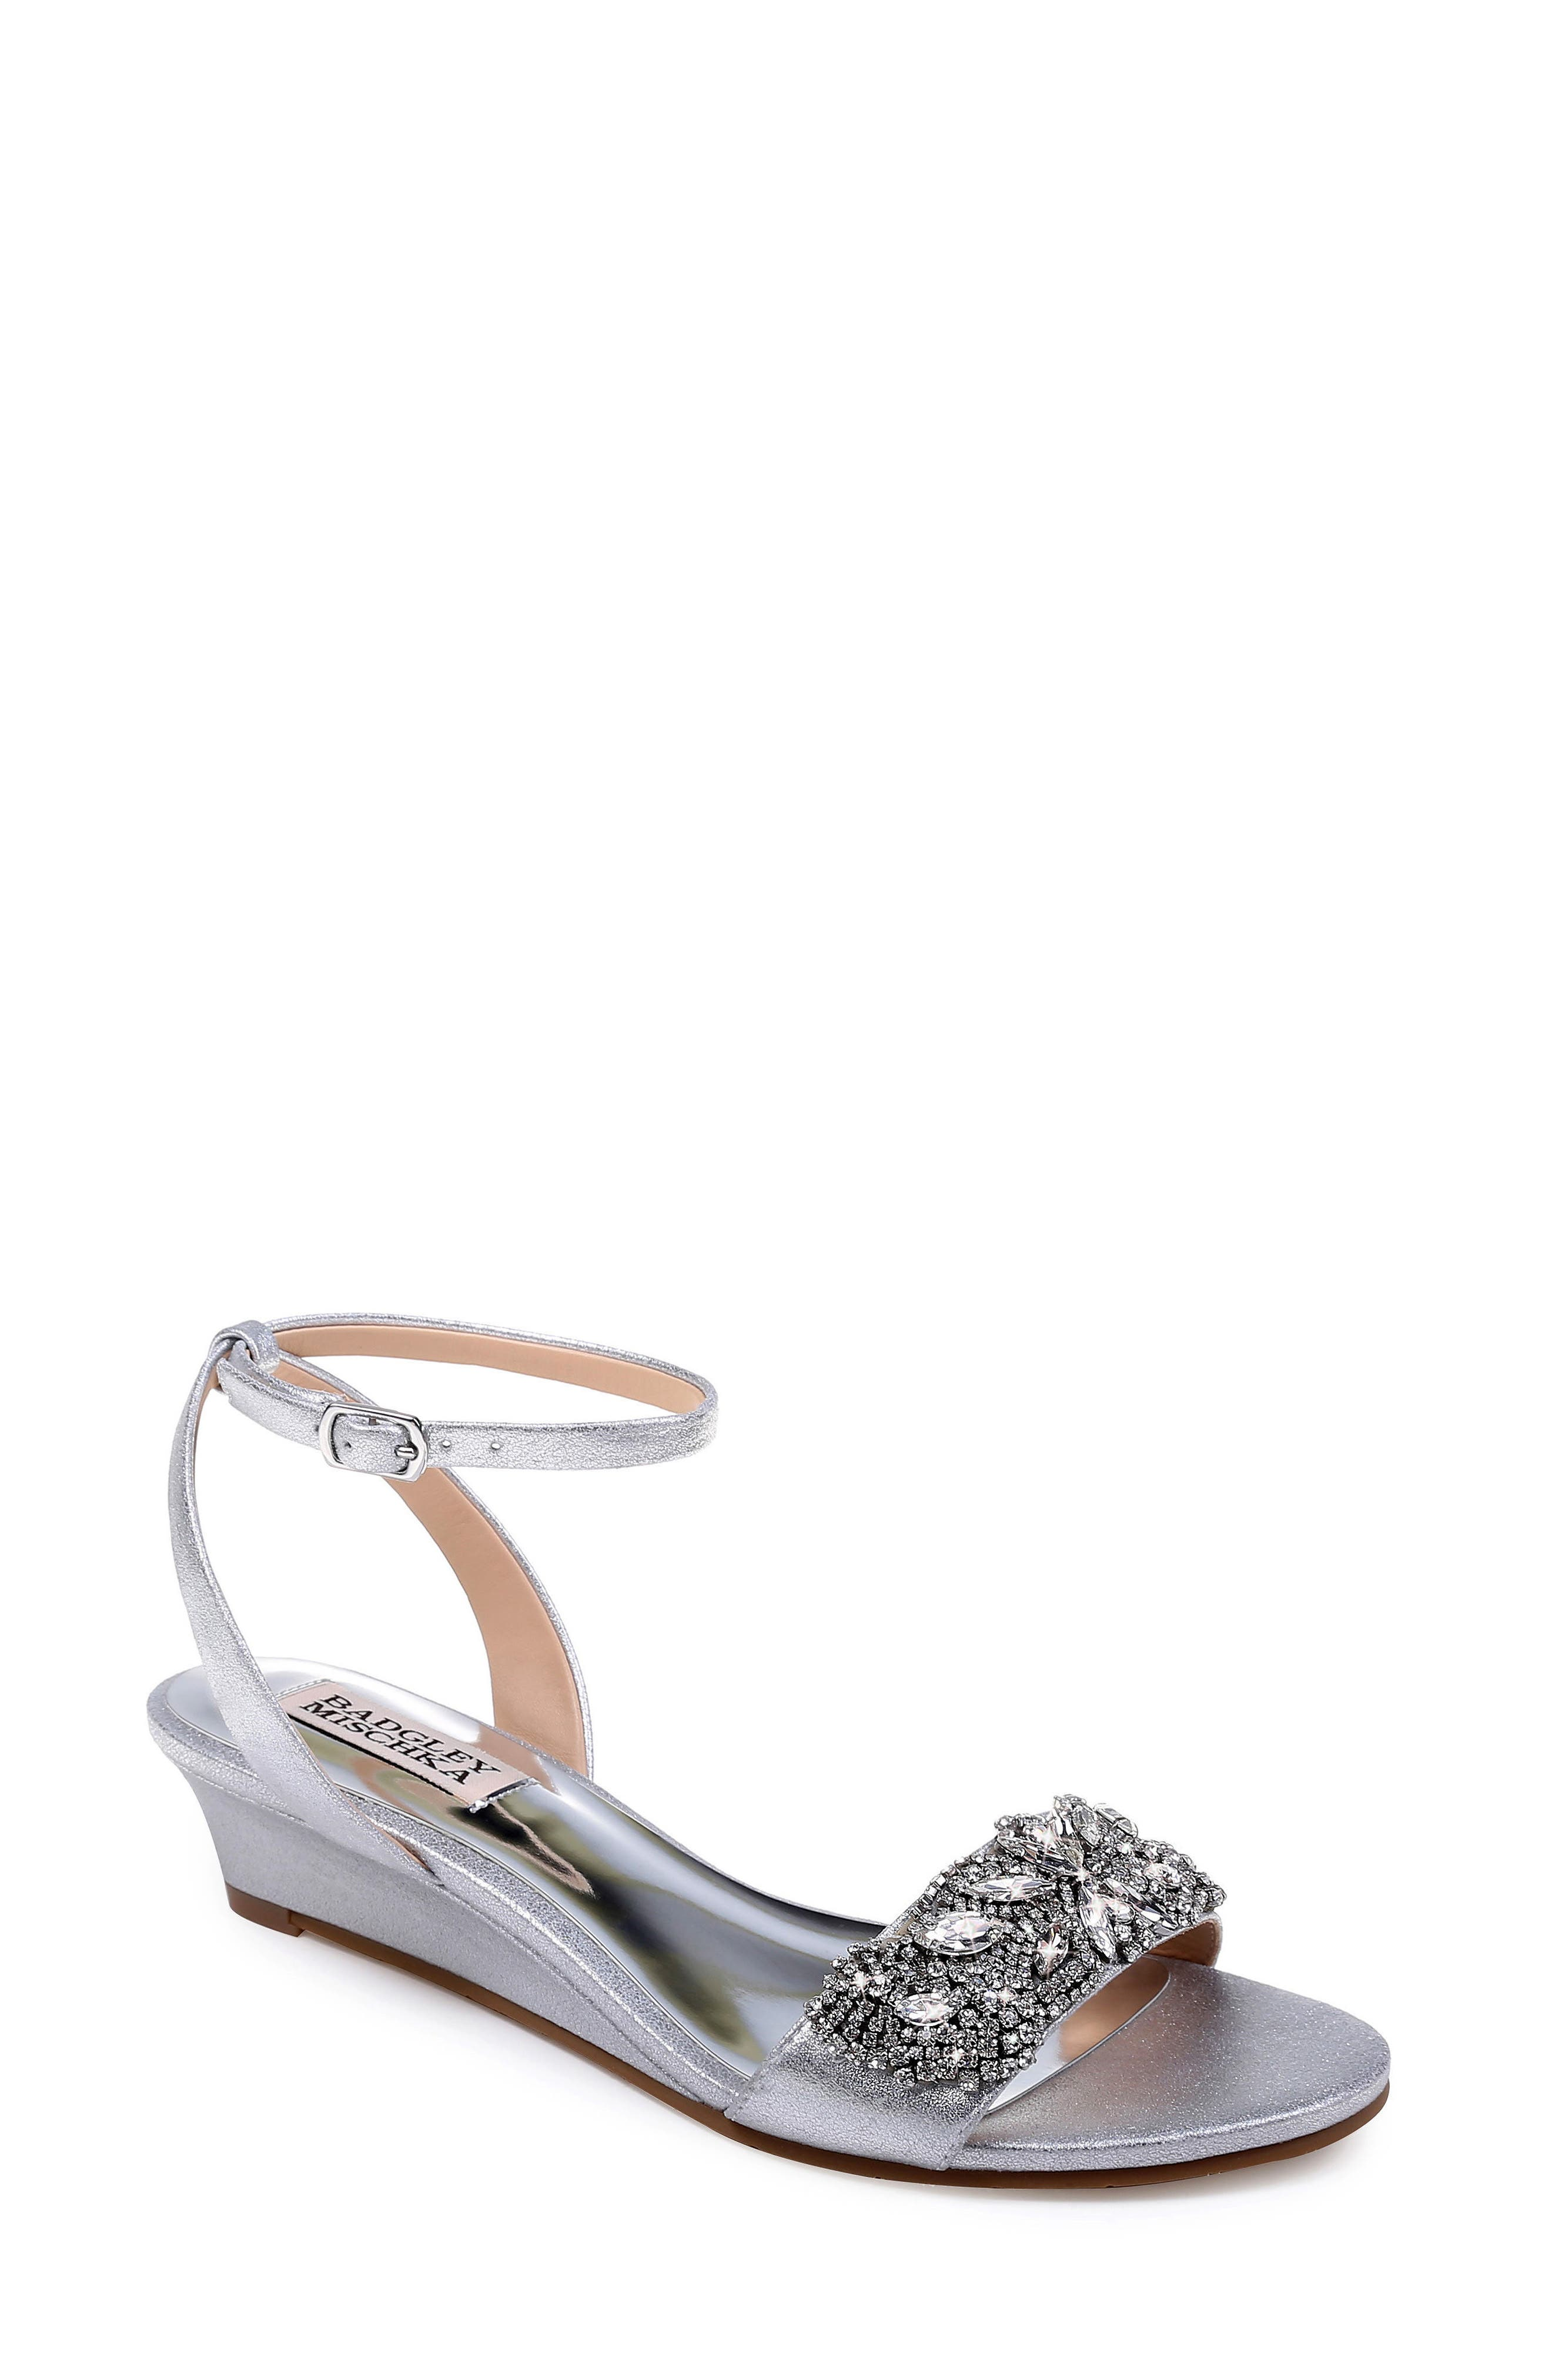 Badgley Mischka Hatch Crystal Embellished Sandal- Metallic